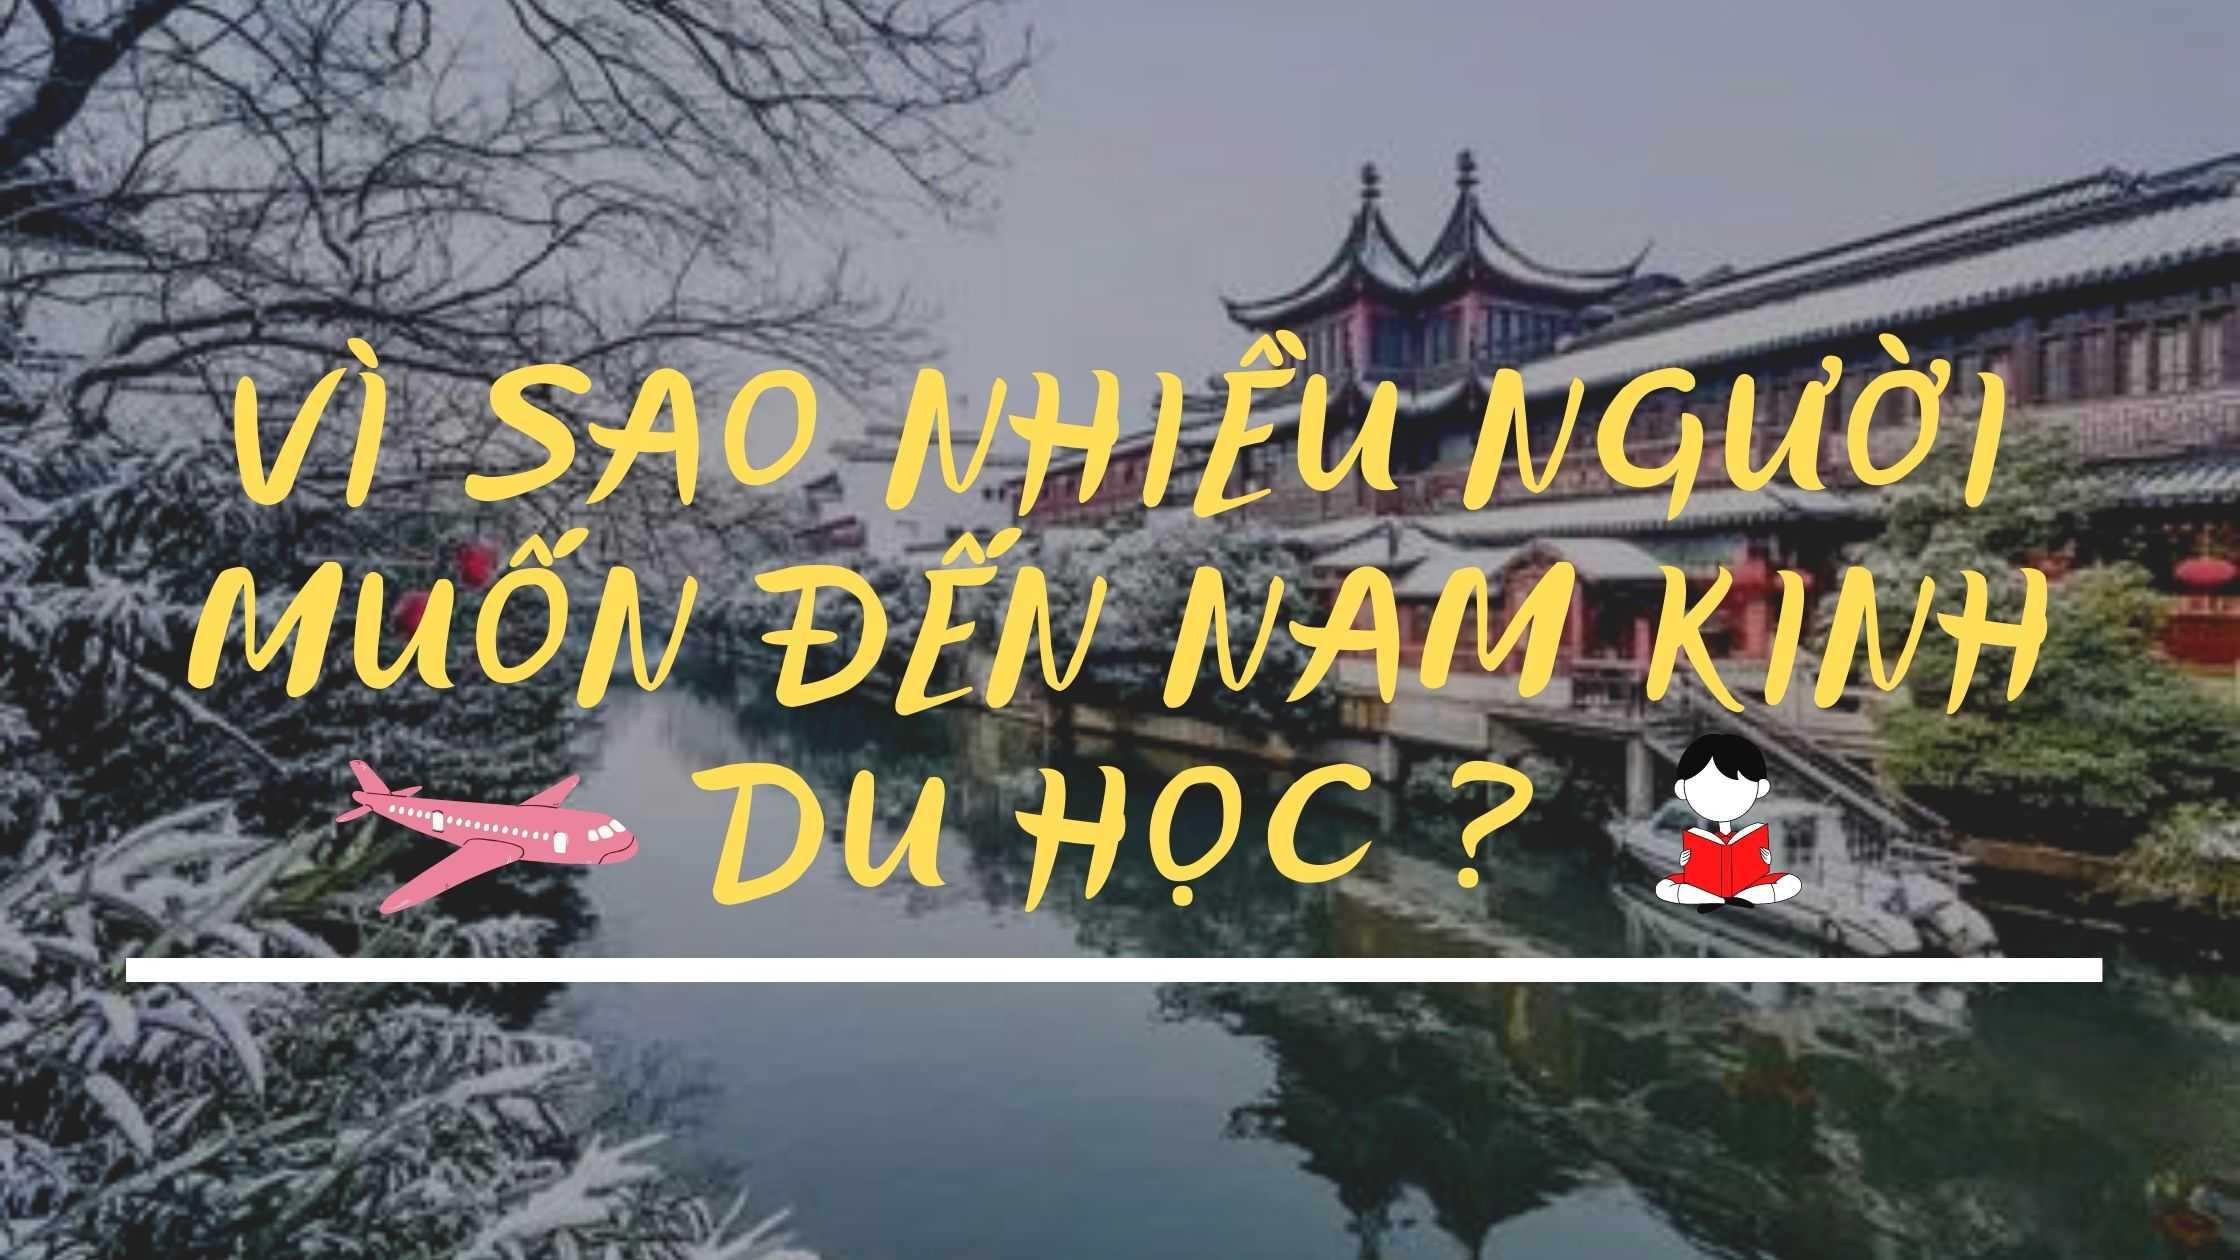 Nam Kinh Du Hoc 2021